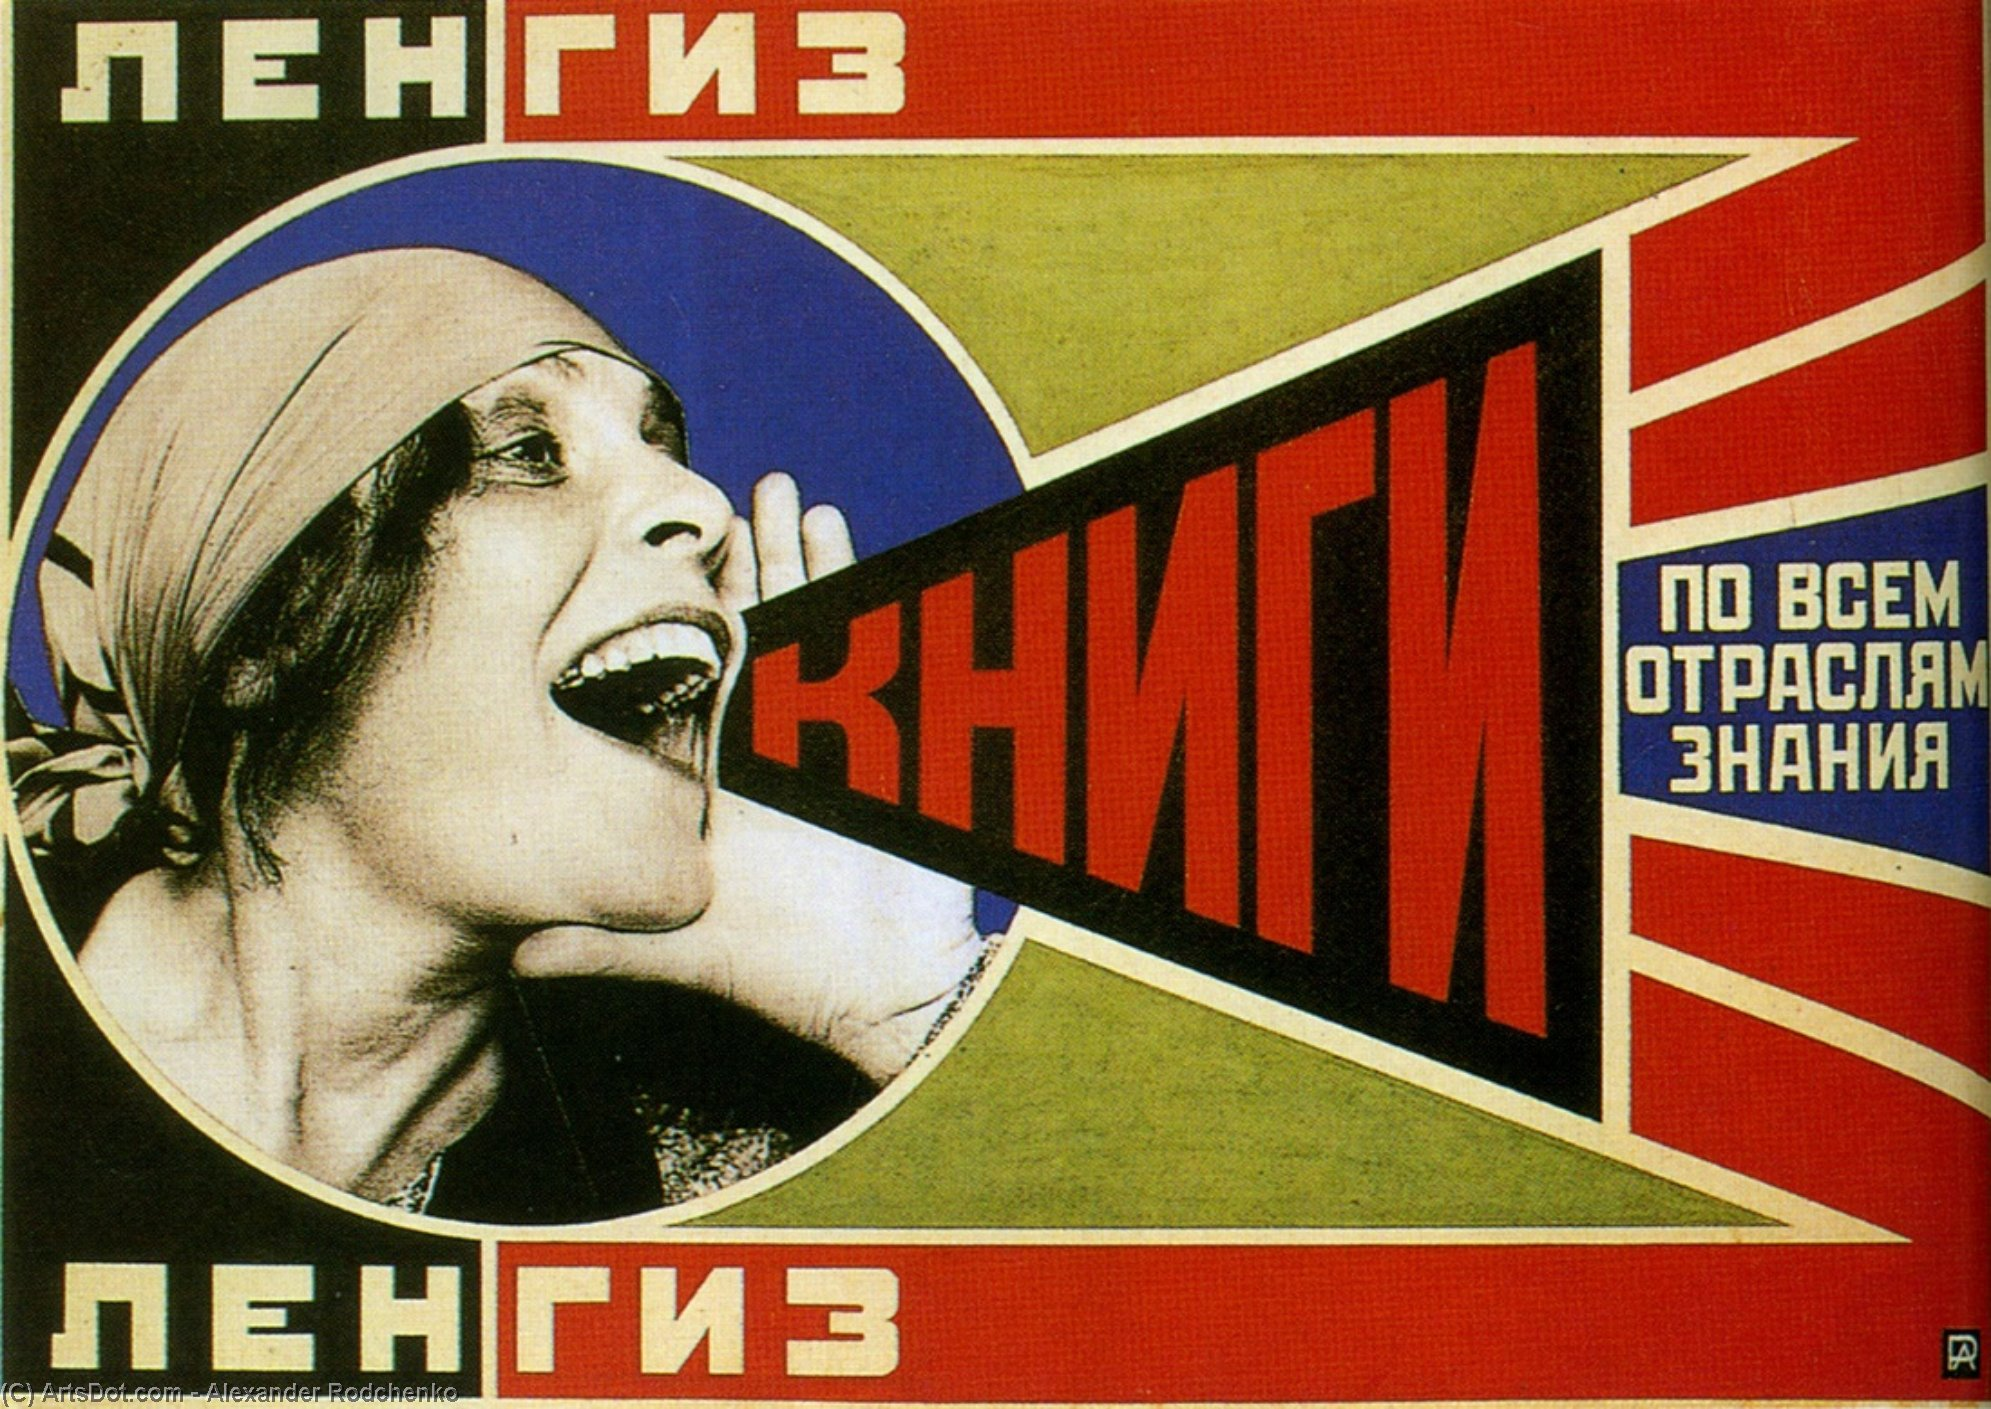 WikiOO.org - Güzel Sanatlar Ansiklopedisi - Resim, Resimler Alexander Rodchenko - Books